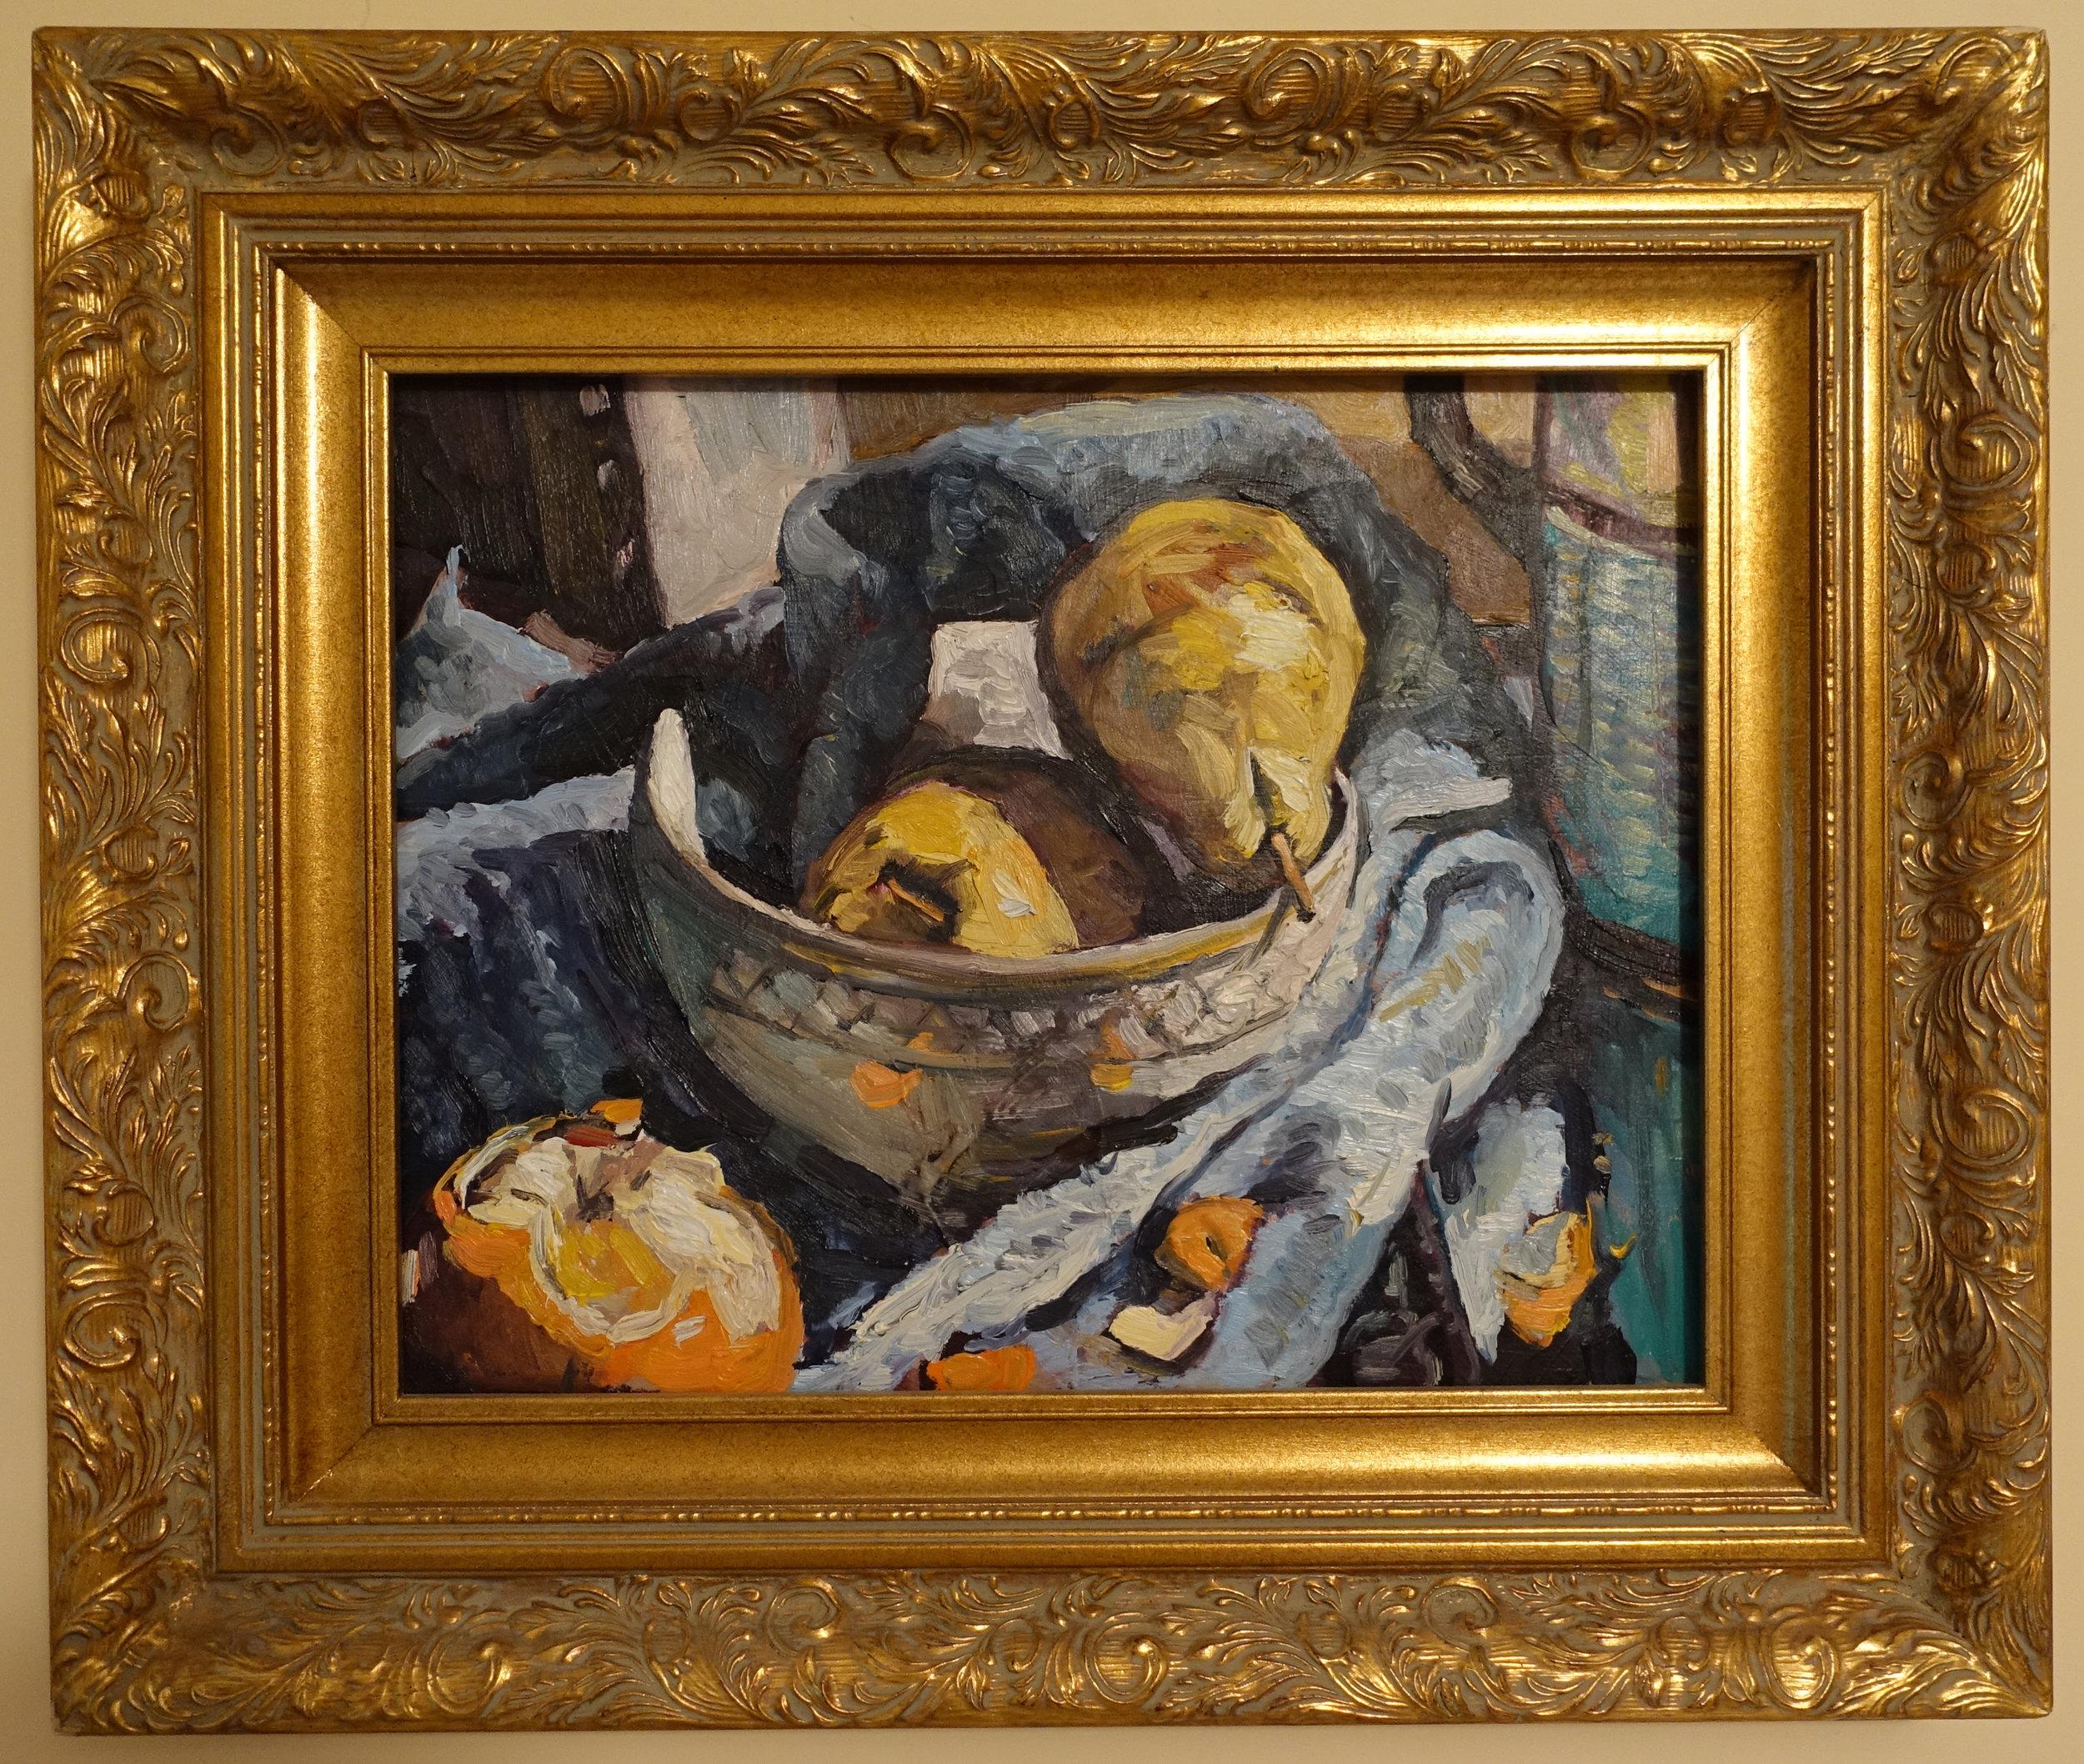 b painting fruit.jpg